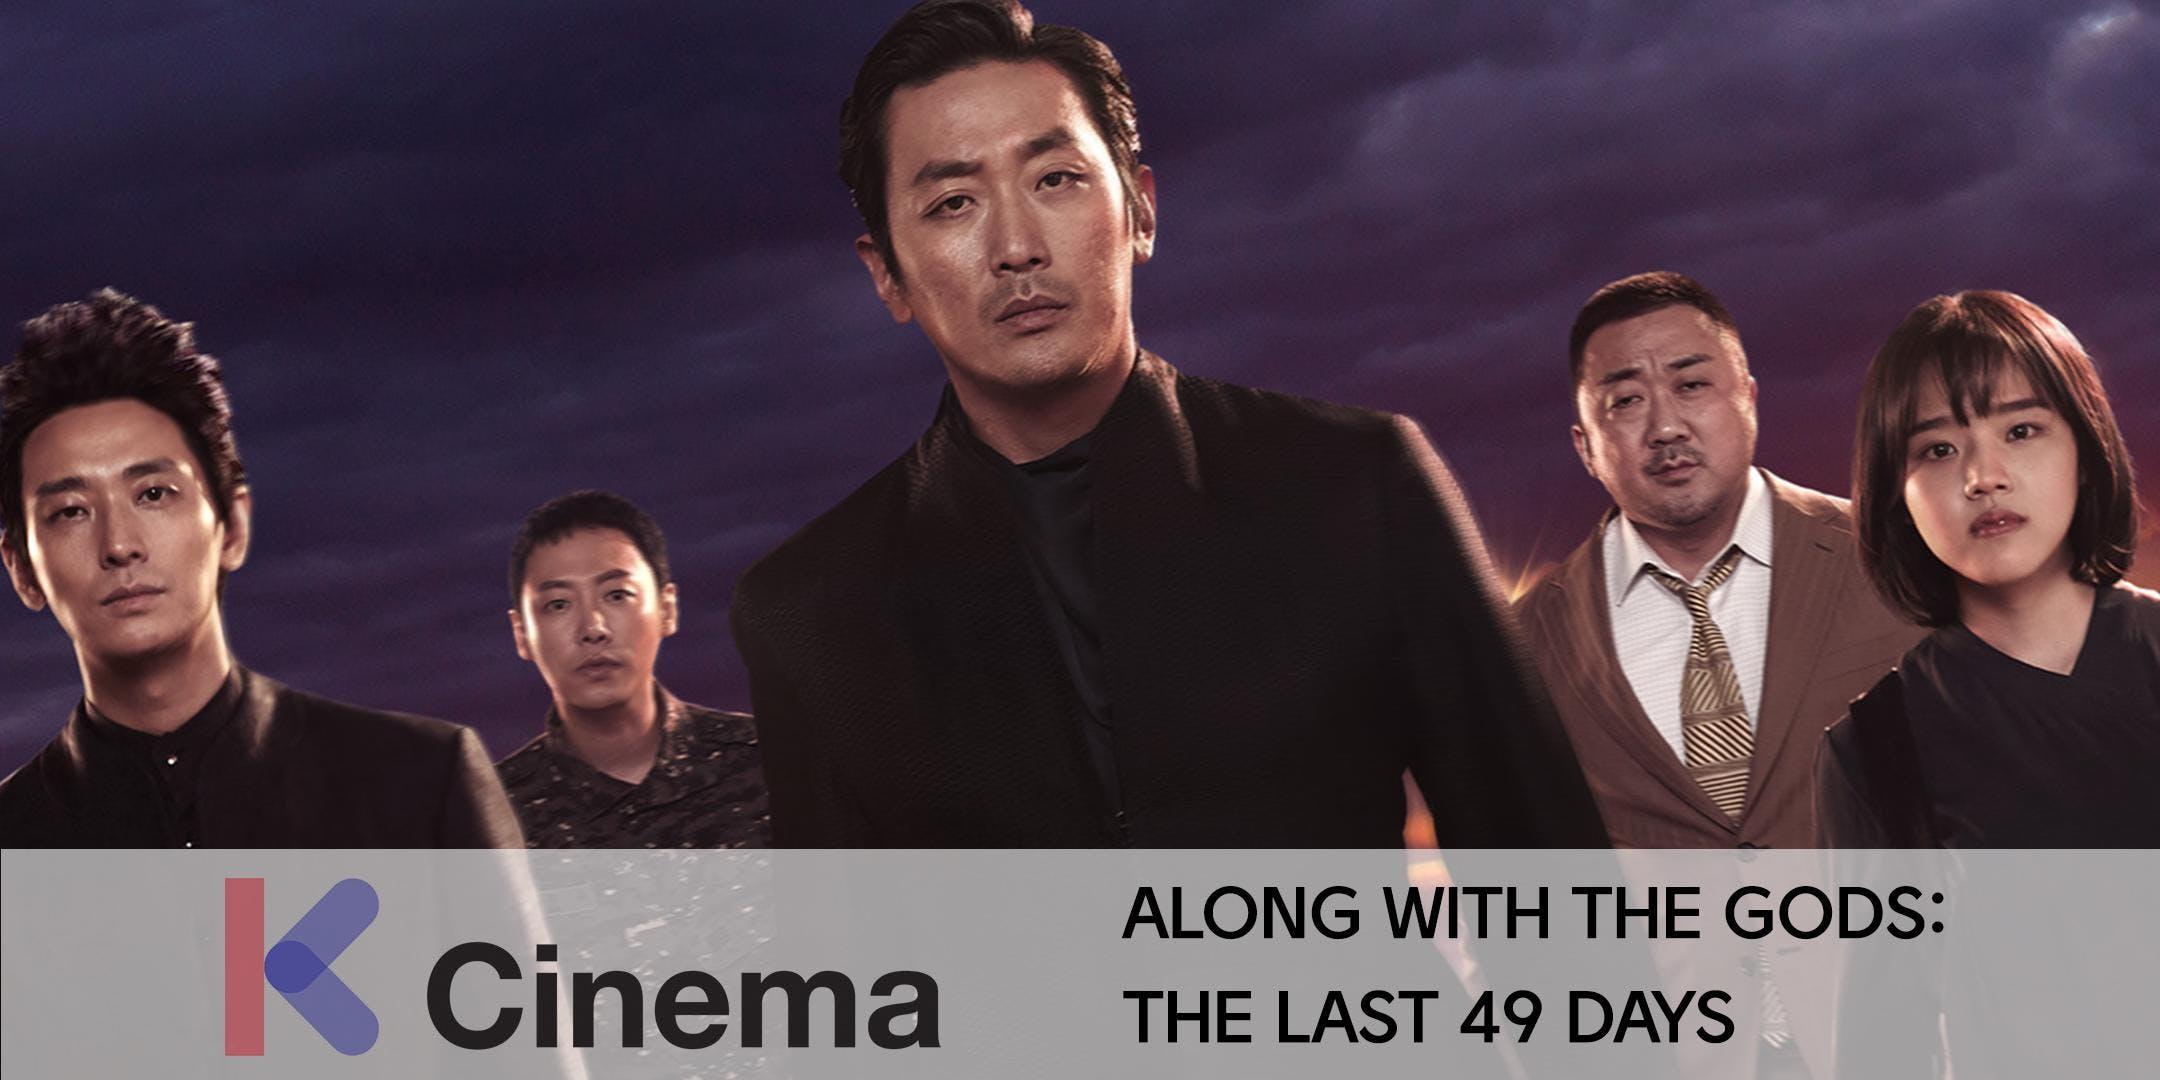 [K-Cinema] 'Along with the Gods: The Last 49